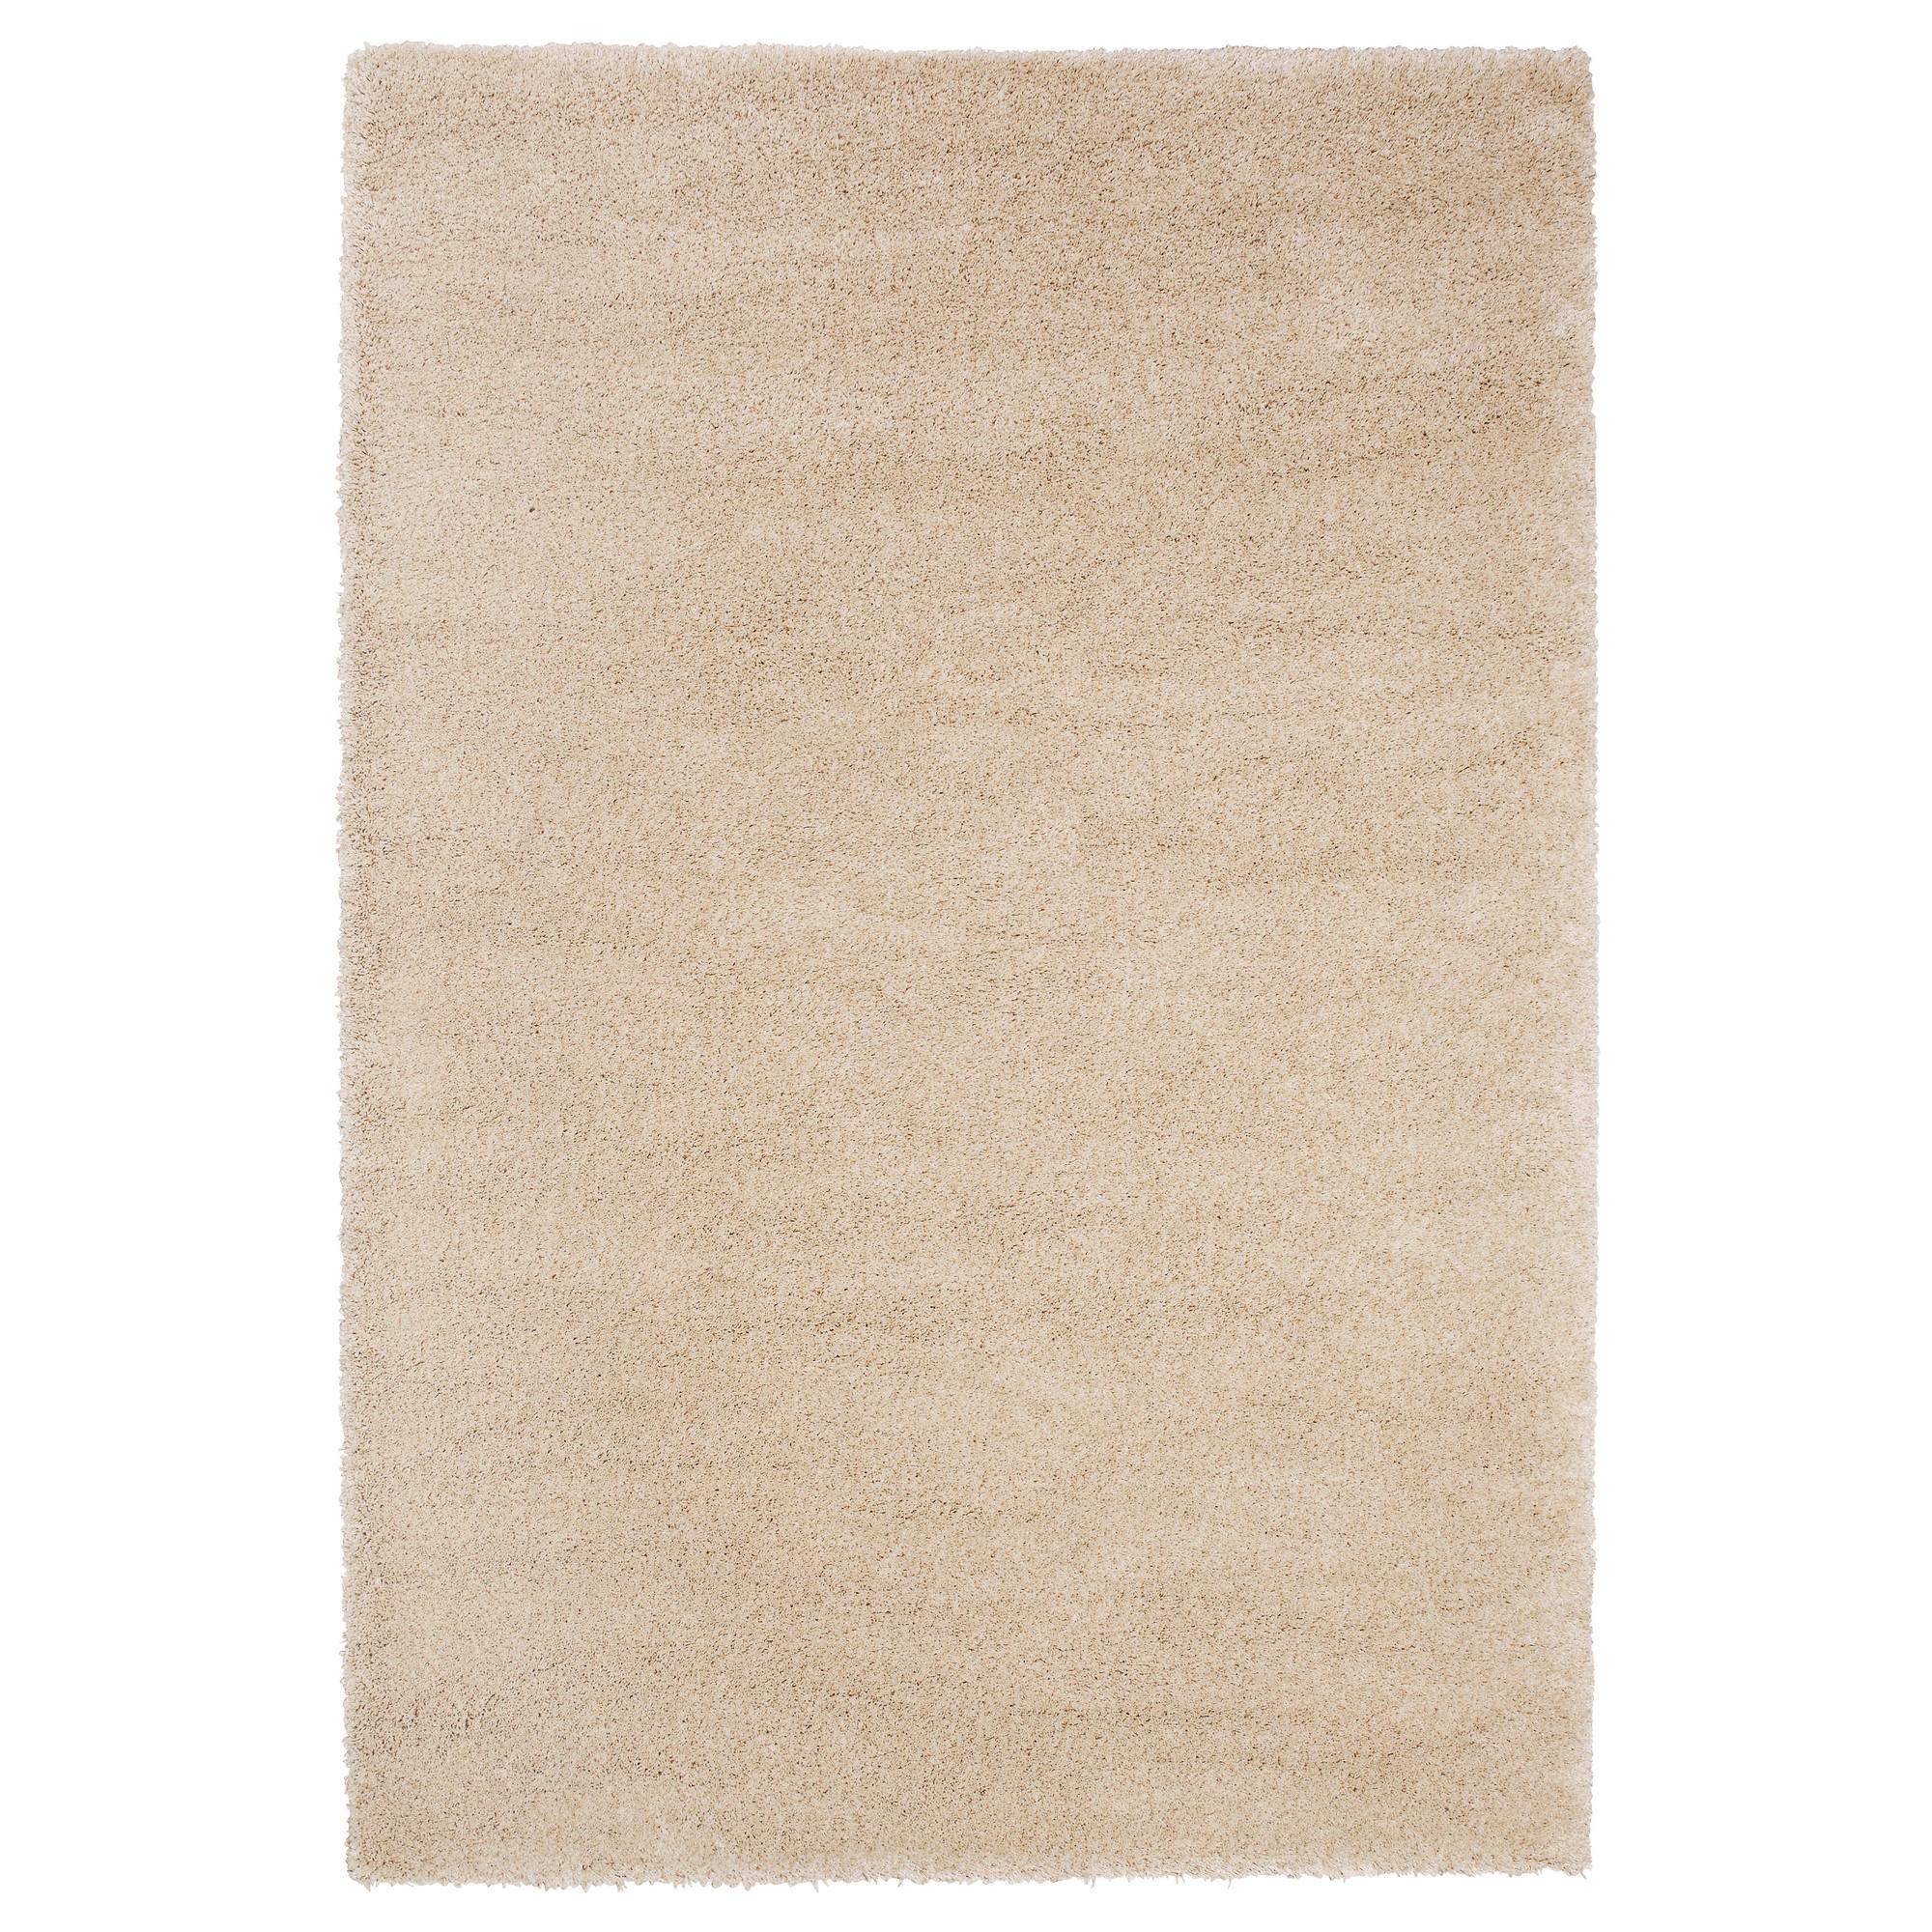 Ådum alfombra, pelo corto 170x240 hueso